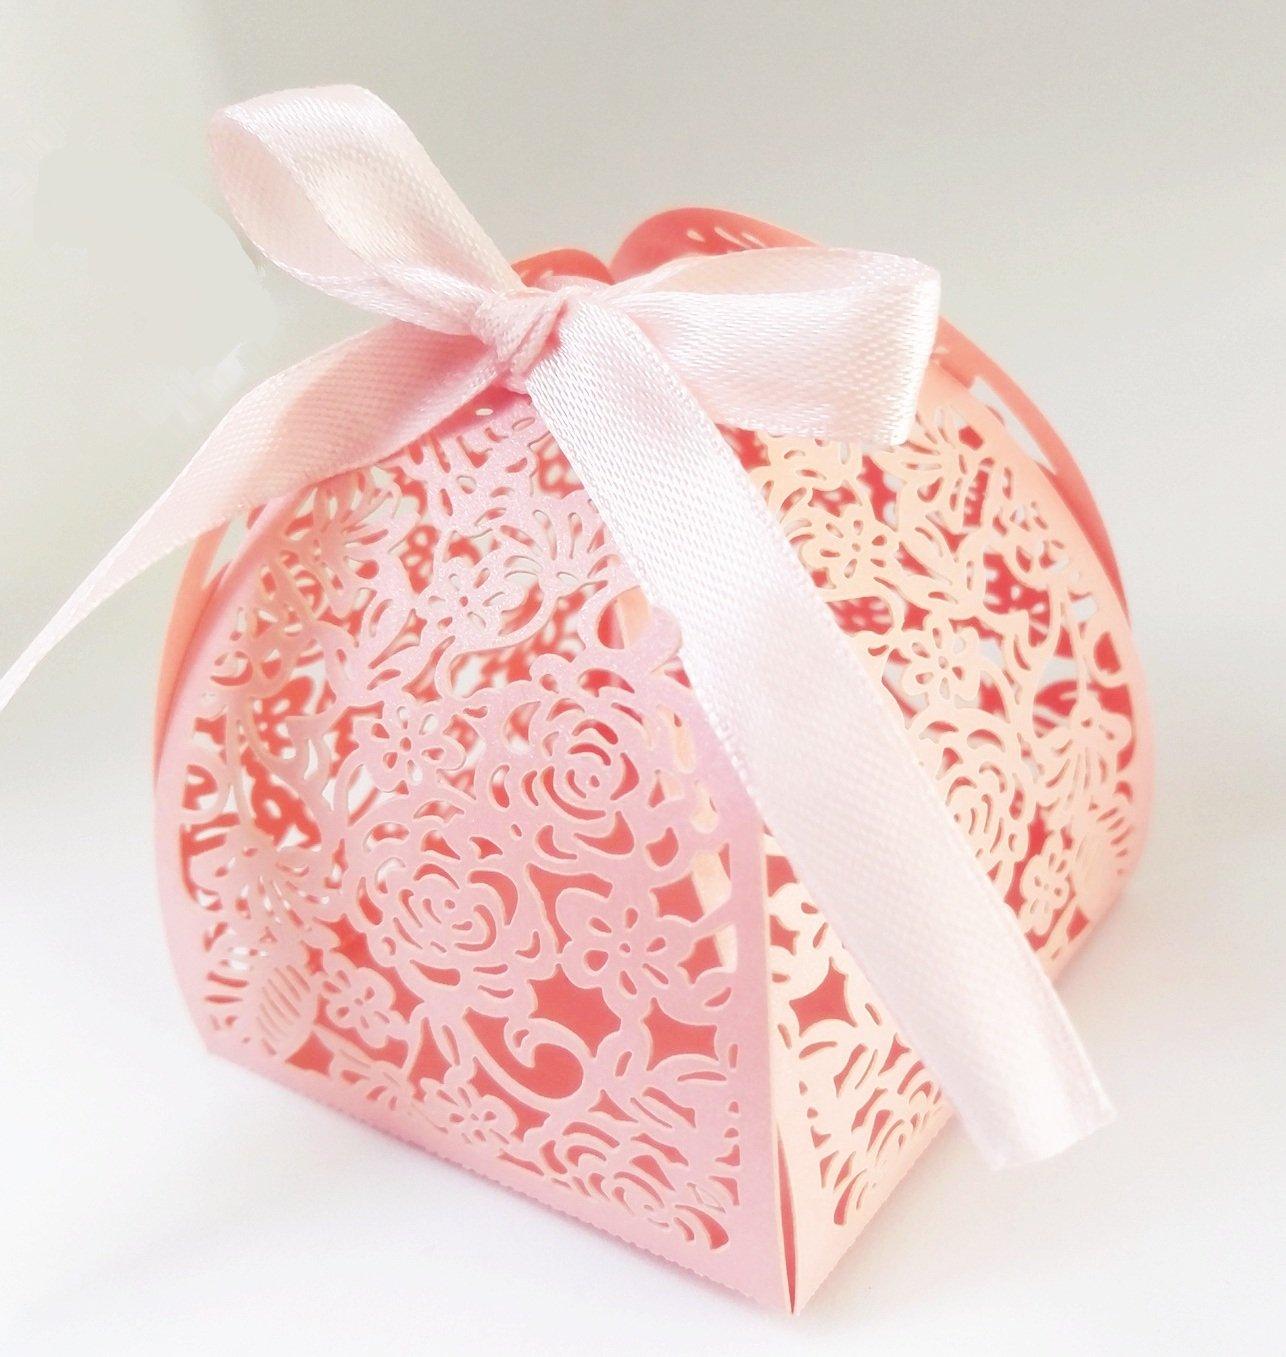 Amazon.com: 100 Pcs Laser Cut Rose Creative Chocolate Box Wedding ...